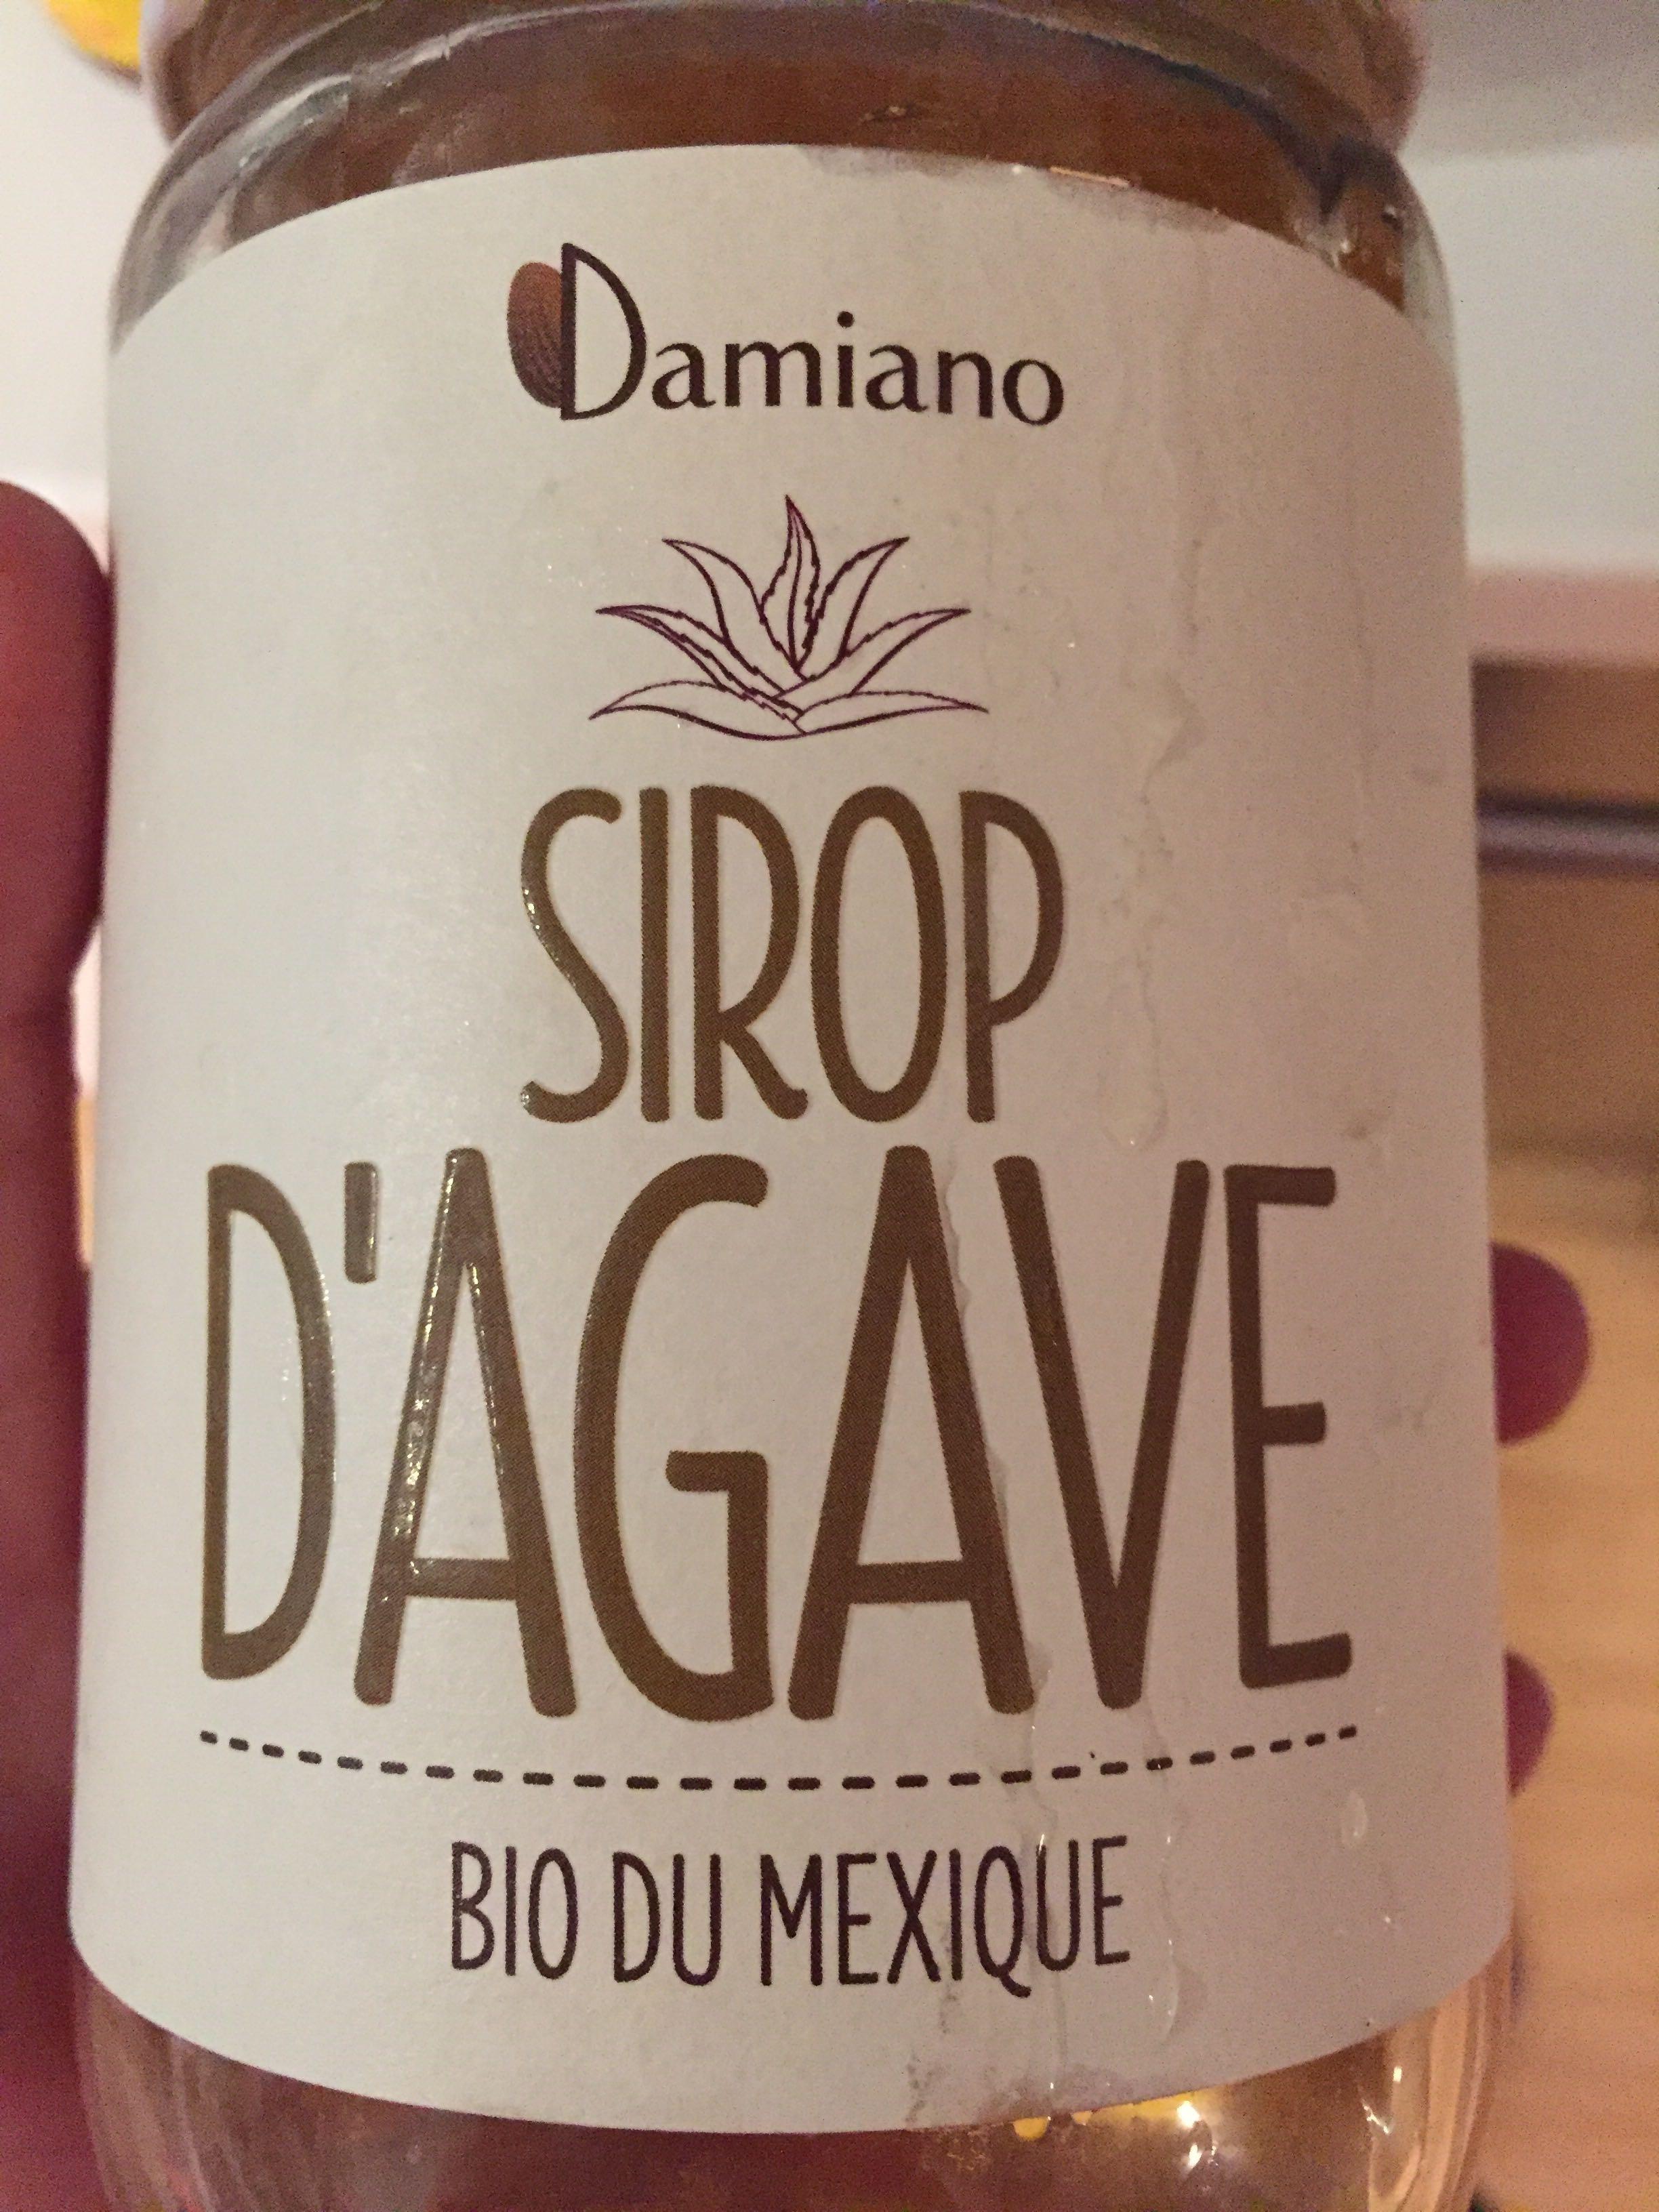 Sirop d 39 agave bio du mexique damiano 840 g - Agave du mexique ...